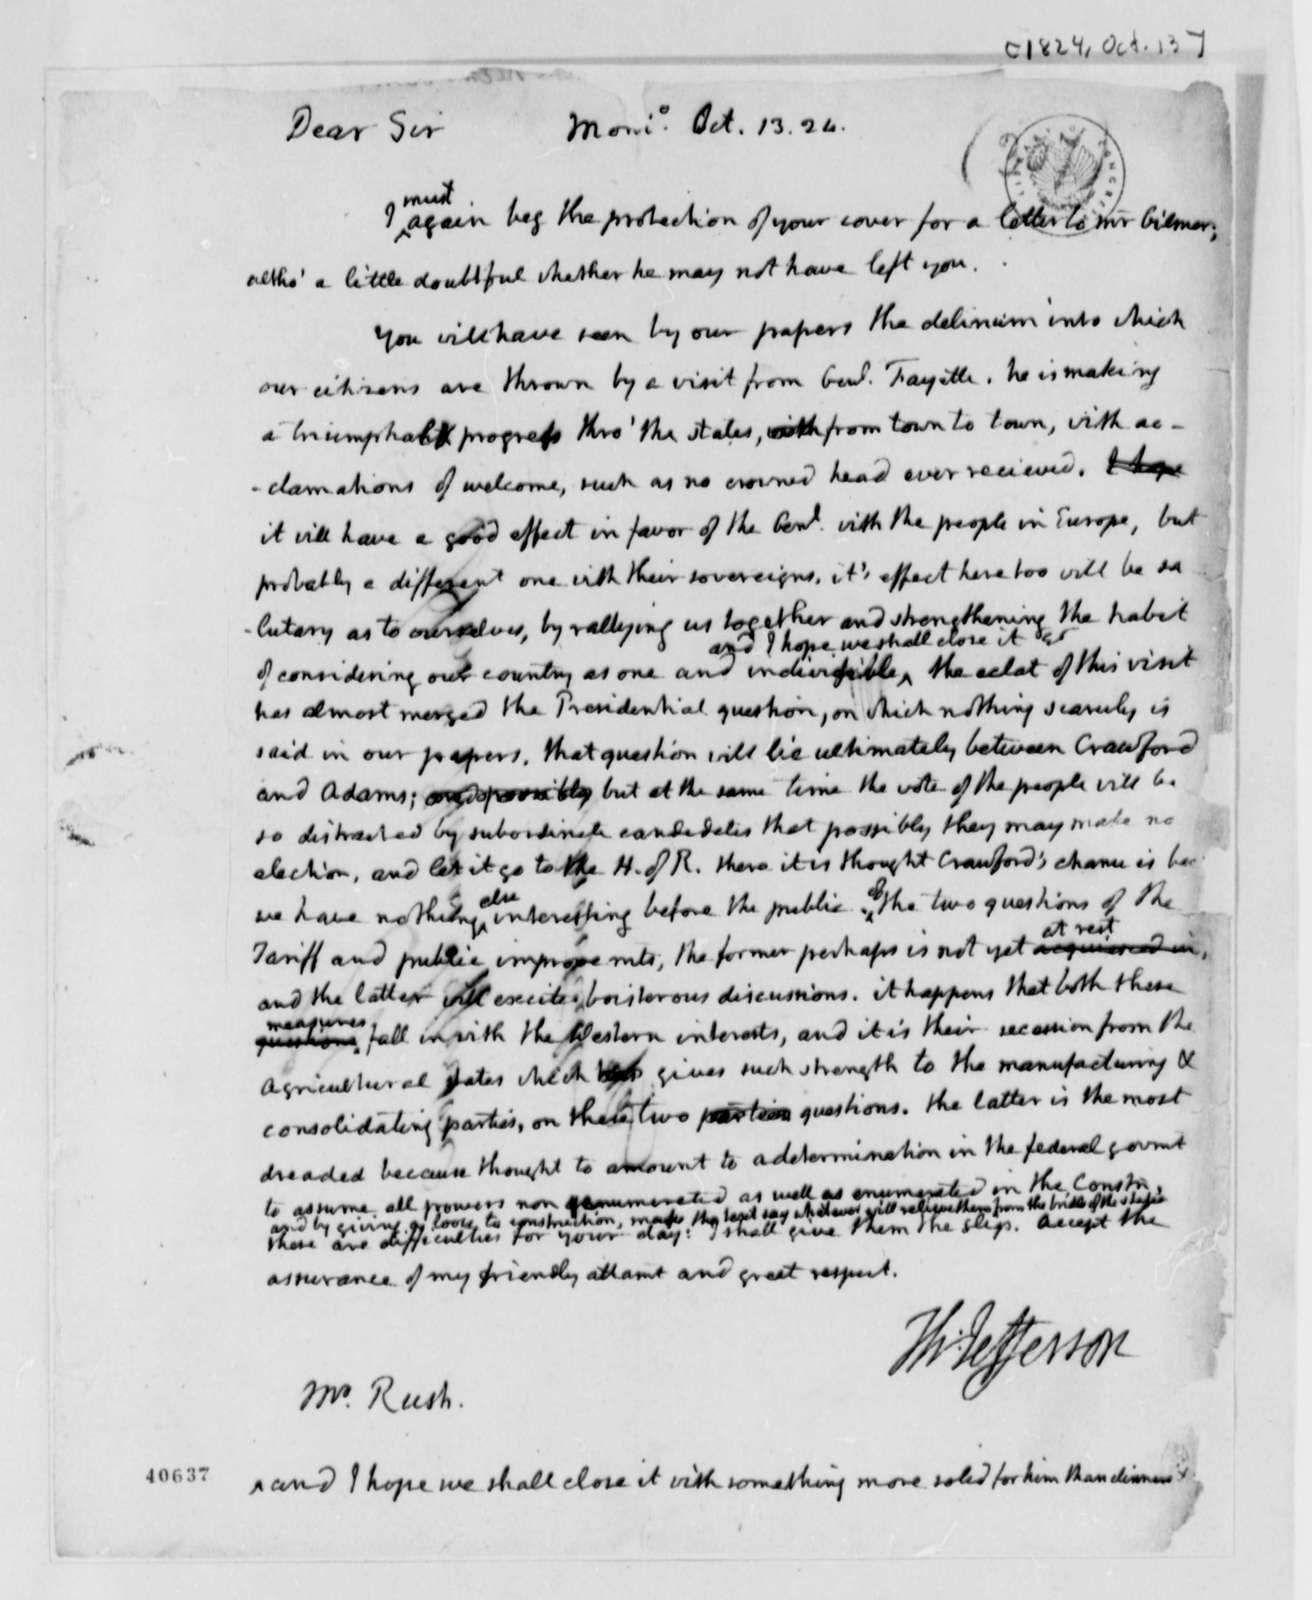 Thomas Jefferson to Richard Rush, October 13, 1824